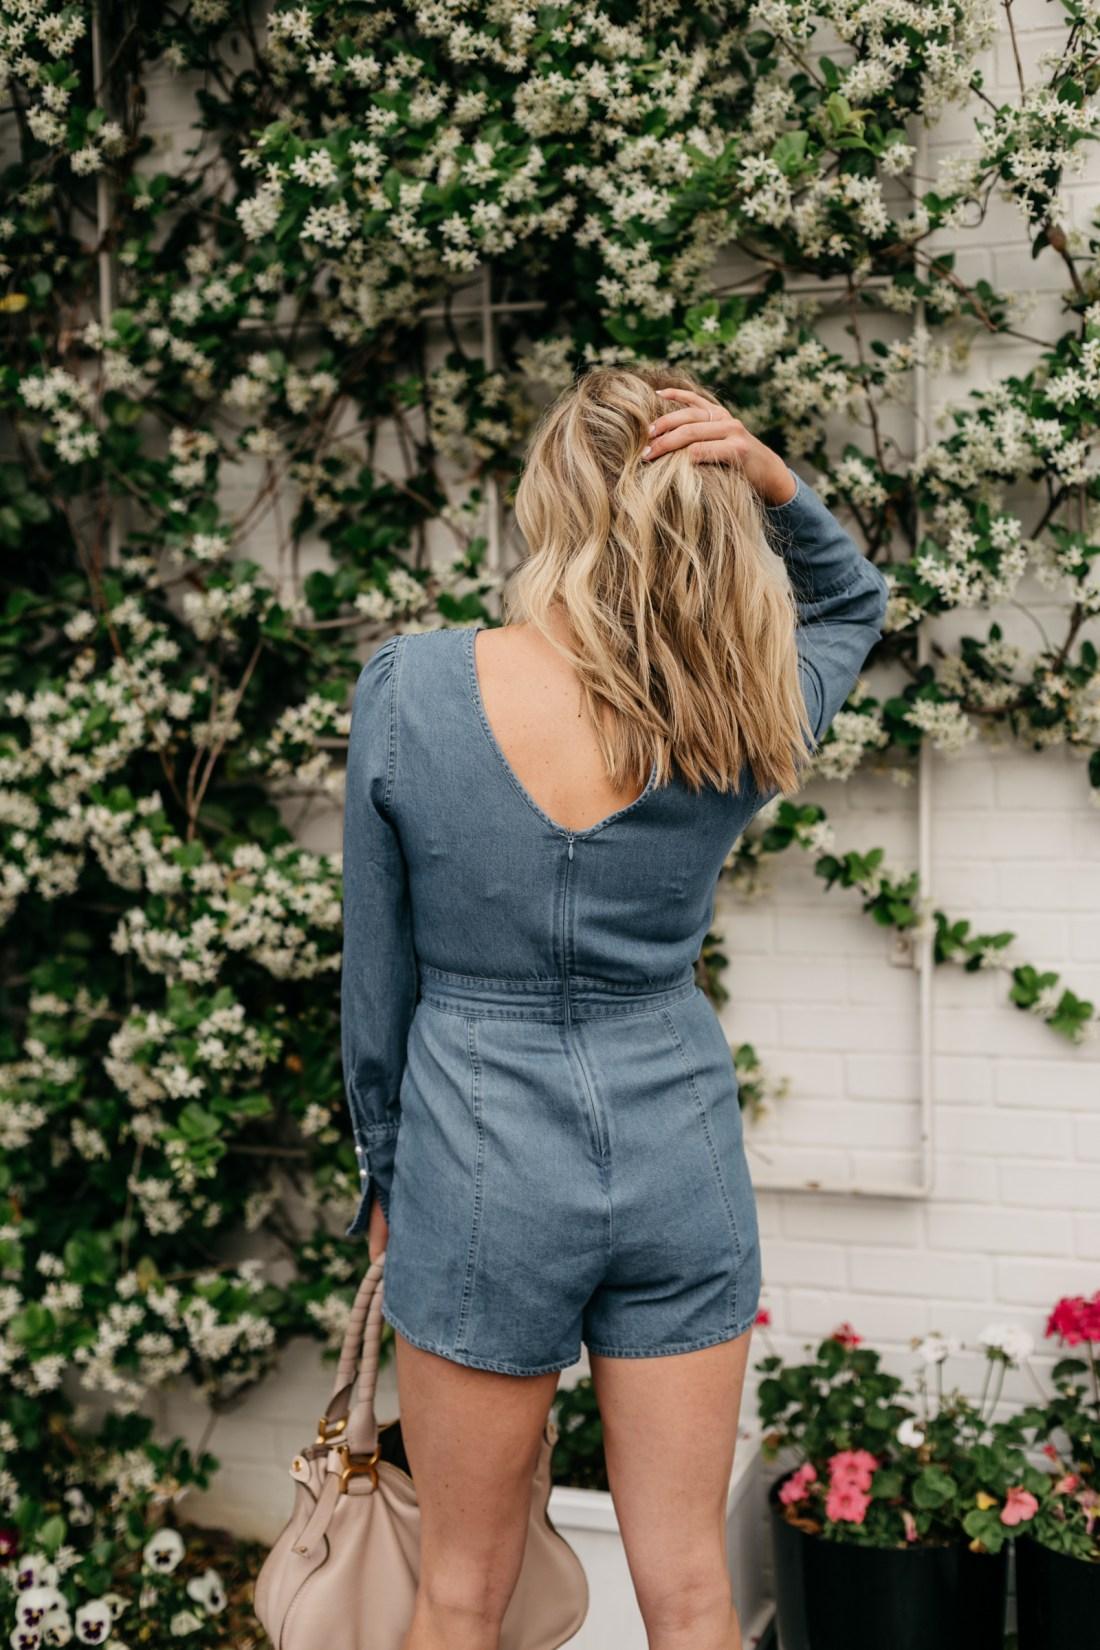 Spring Rompers on the blog - Brooke's outfit details: Denim Romper // Chloe Marcie Handbag